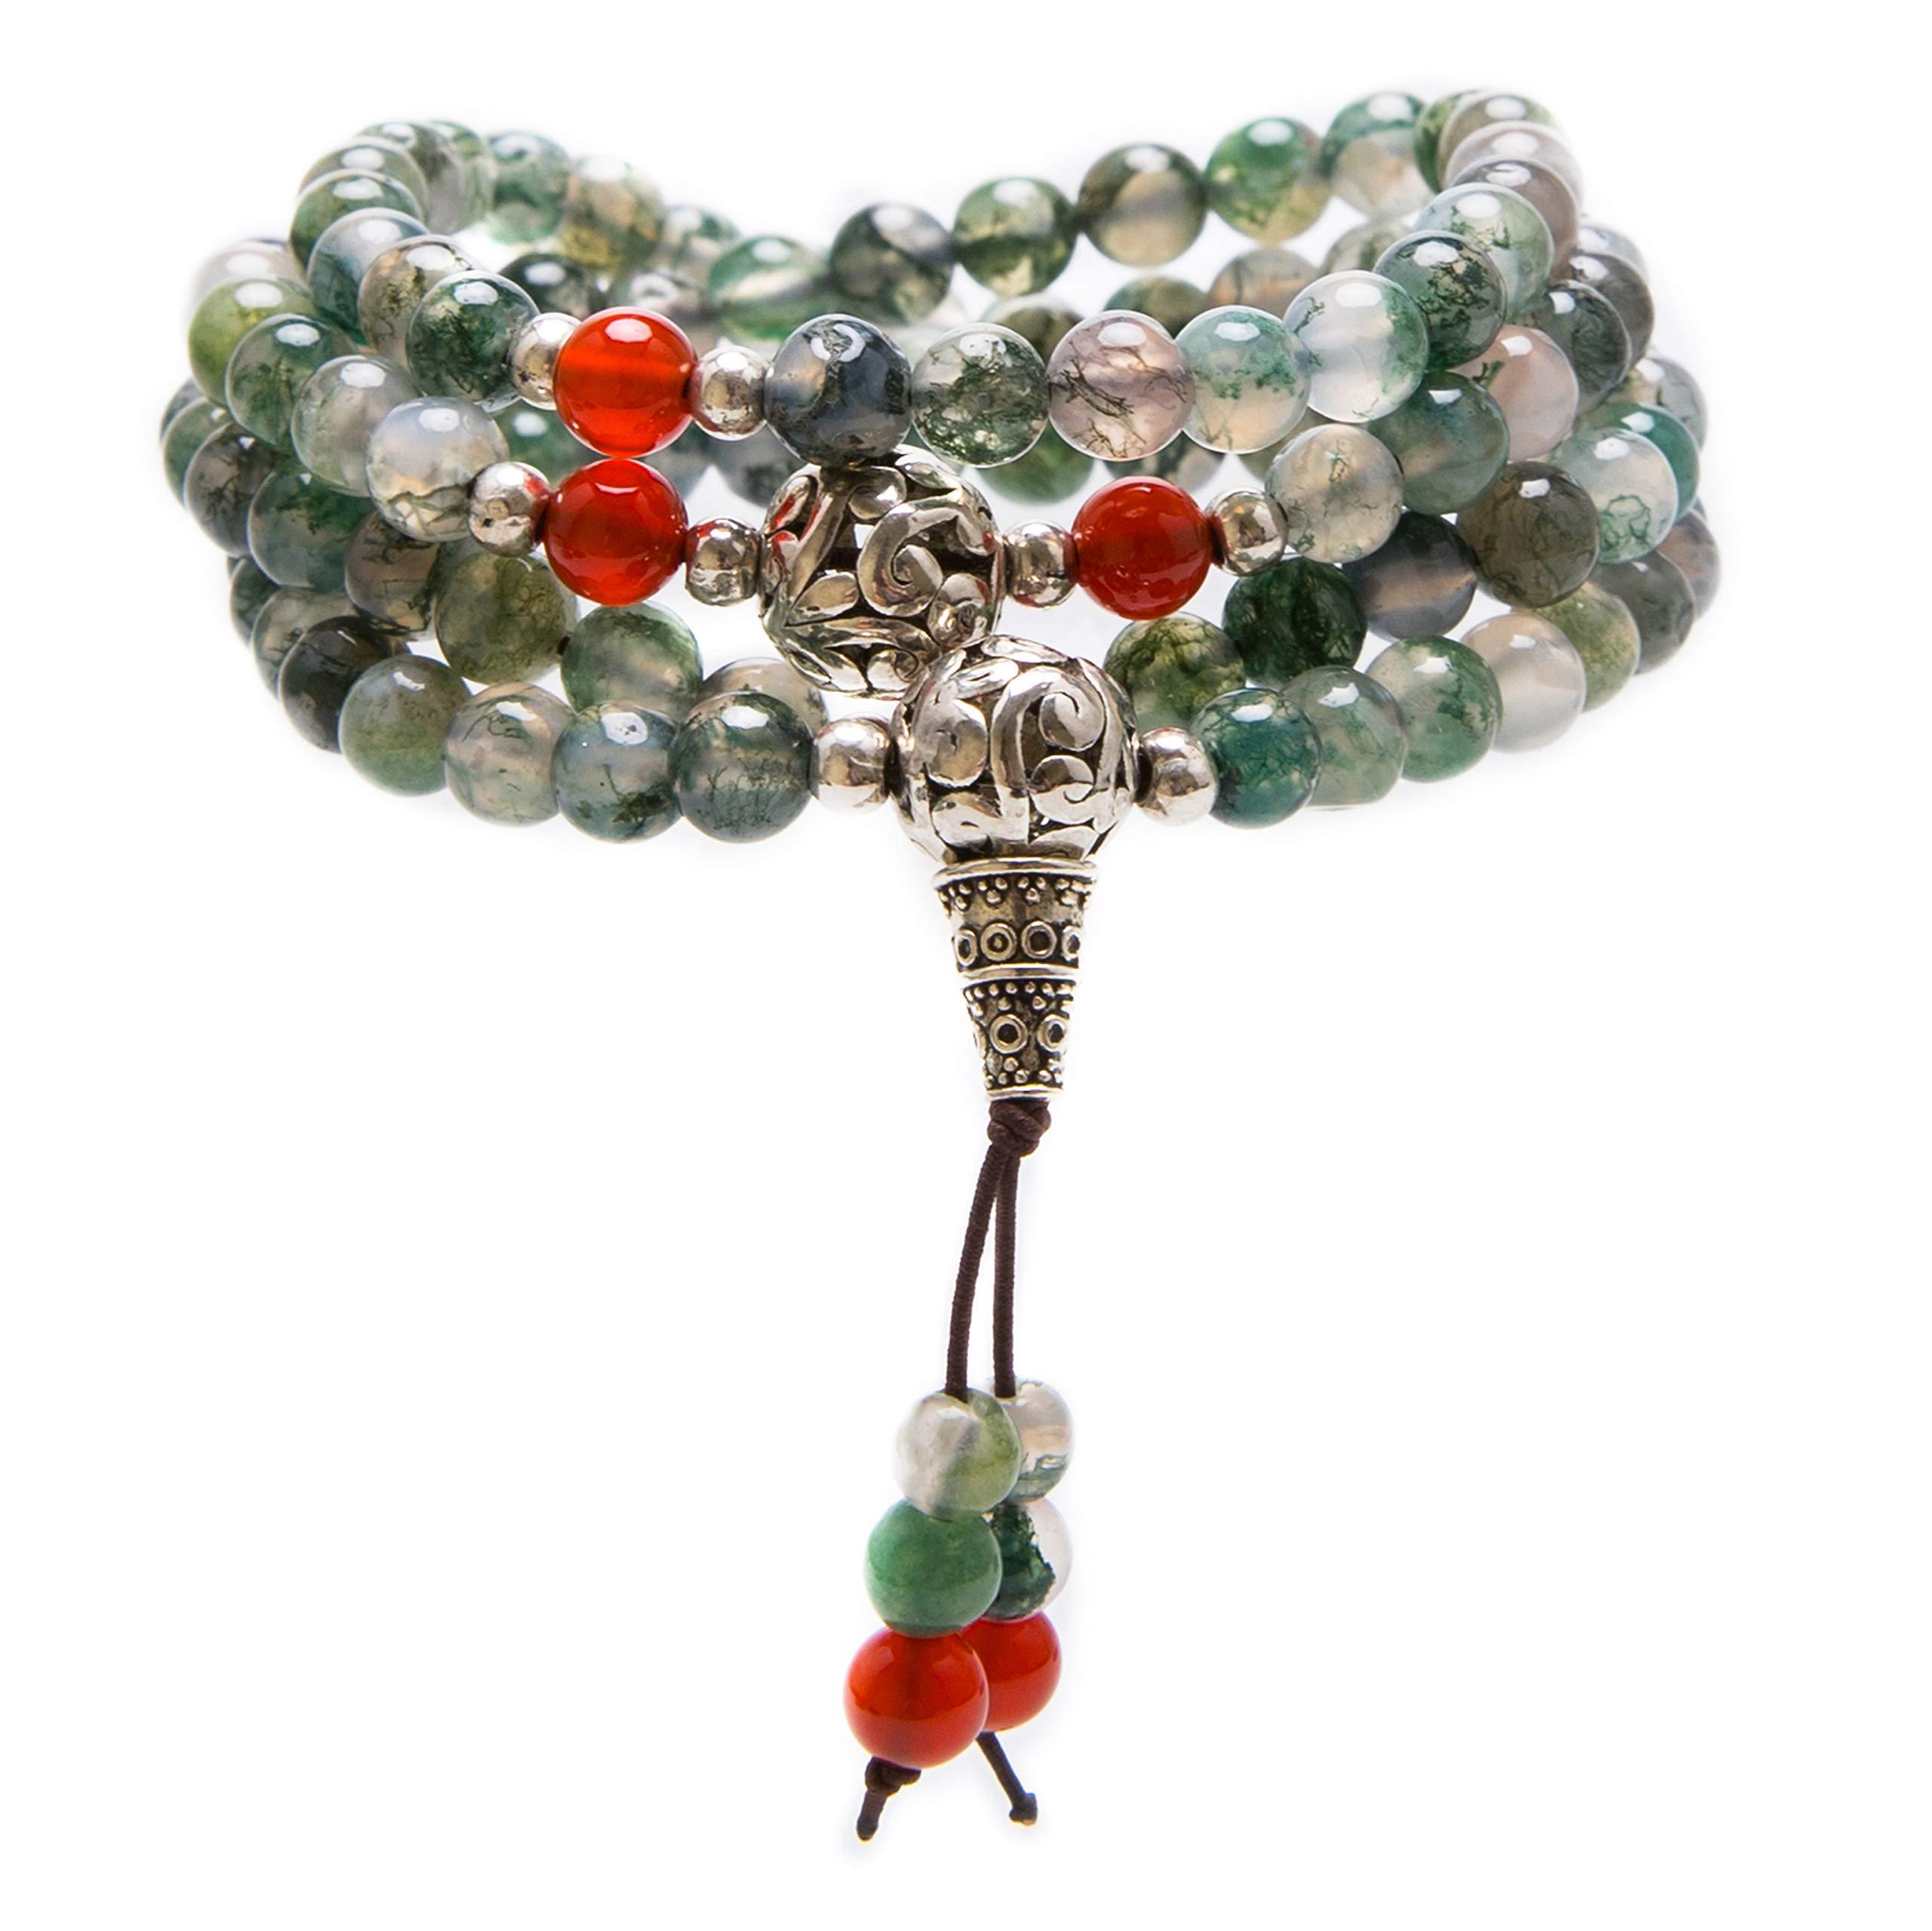 Nupuyai 6mm 108 Healing Gemstone Mala Prayer Beads Stretch Bracelet Necklace for Men and Women